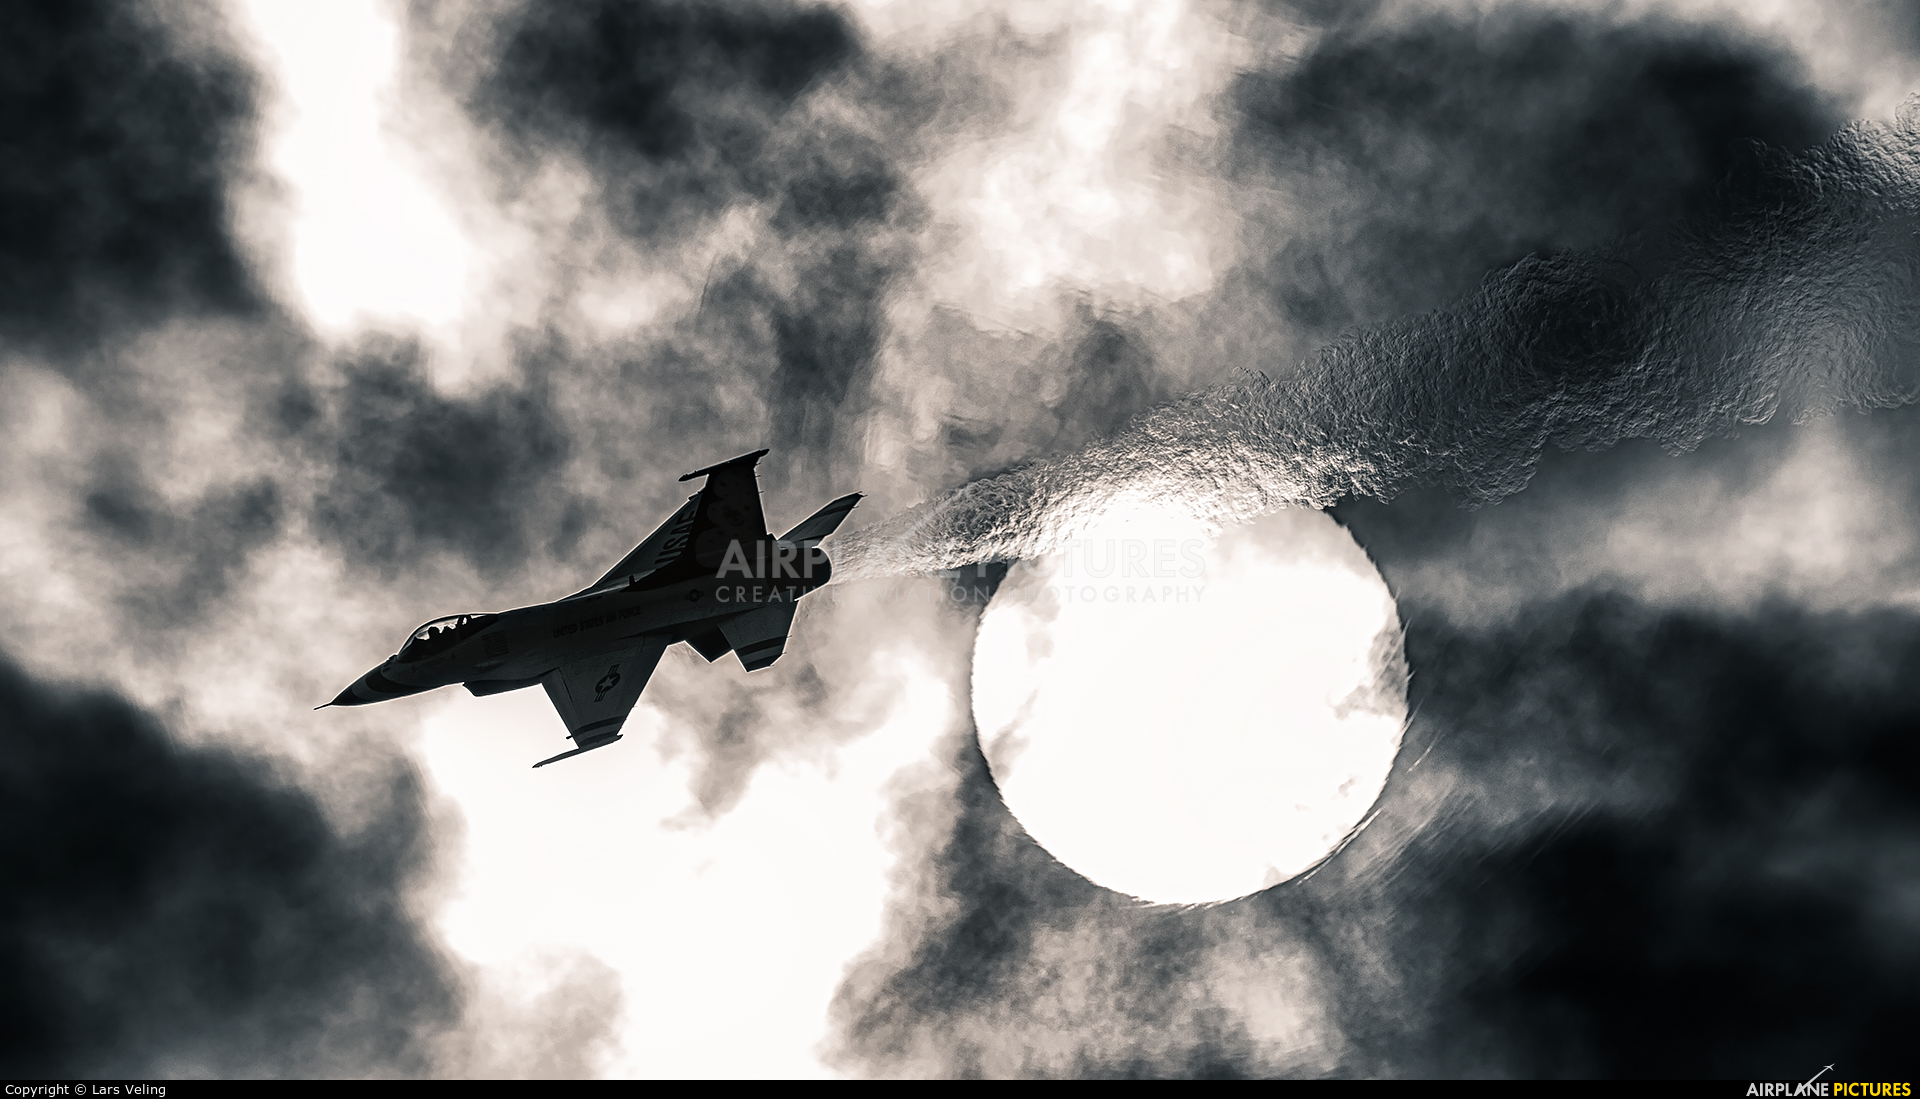 USA - Air Force : Thunderbirds 91-0413 aircraft at Cleveland - Burke Lakefront